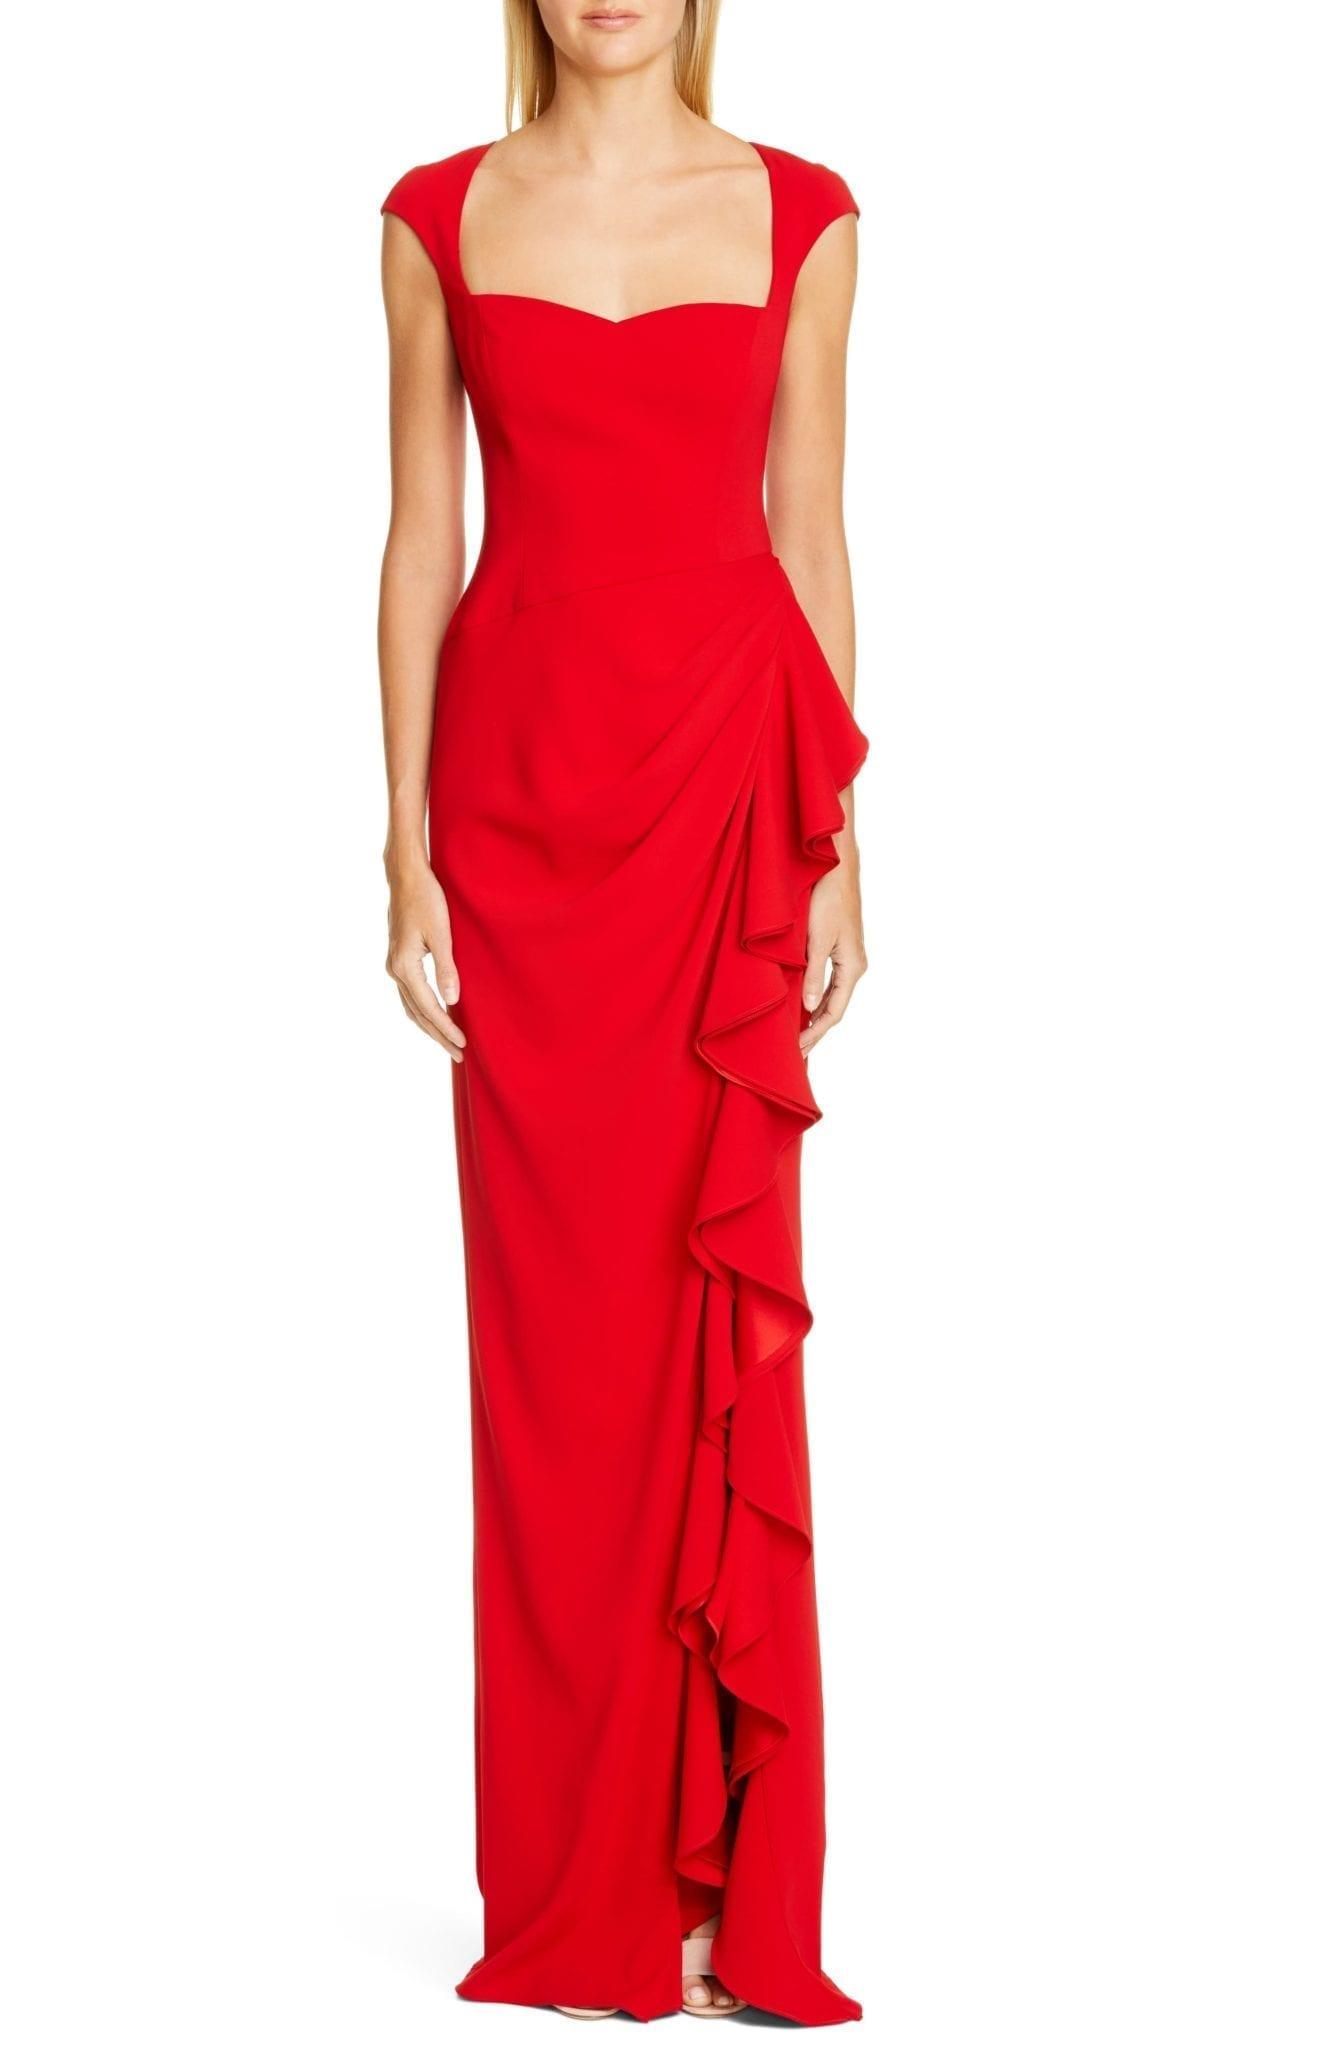 BADGLEY MISCHKA COLLECTION Badgley Mischka Cap Sleeve Ruffle Evening Dress